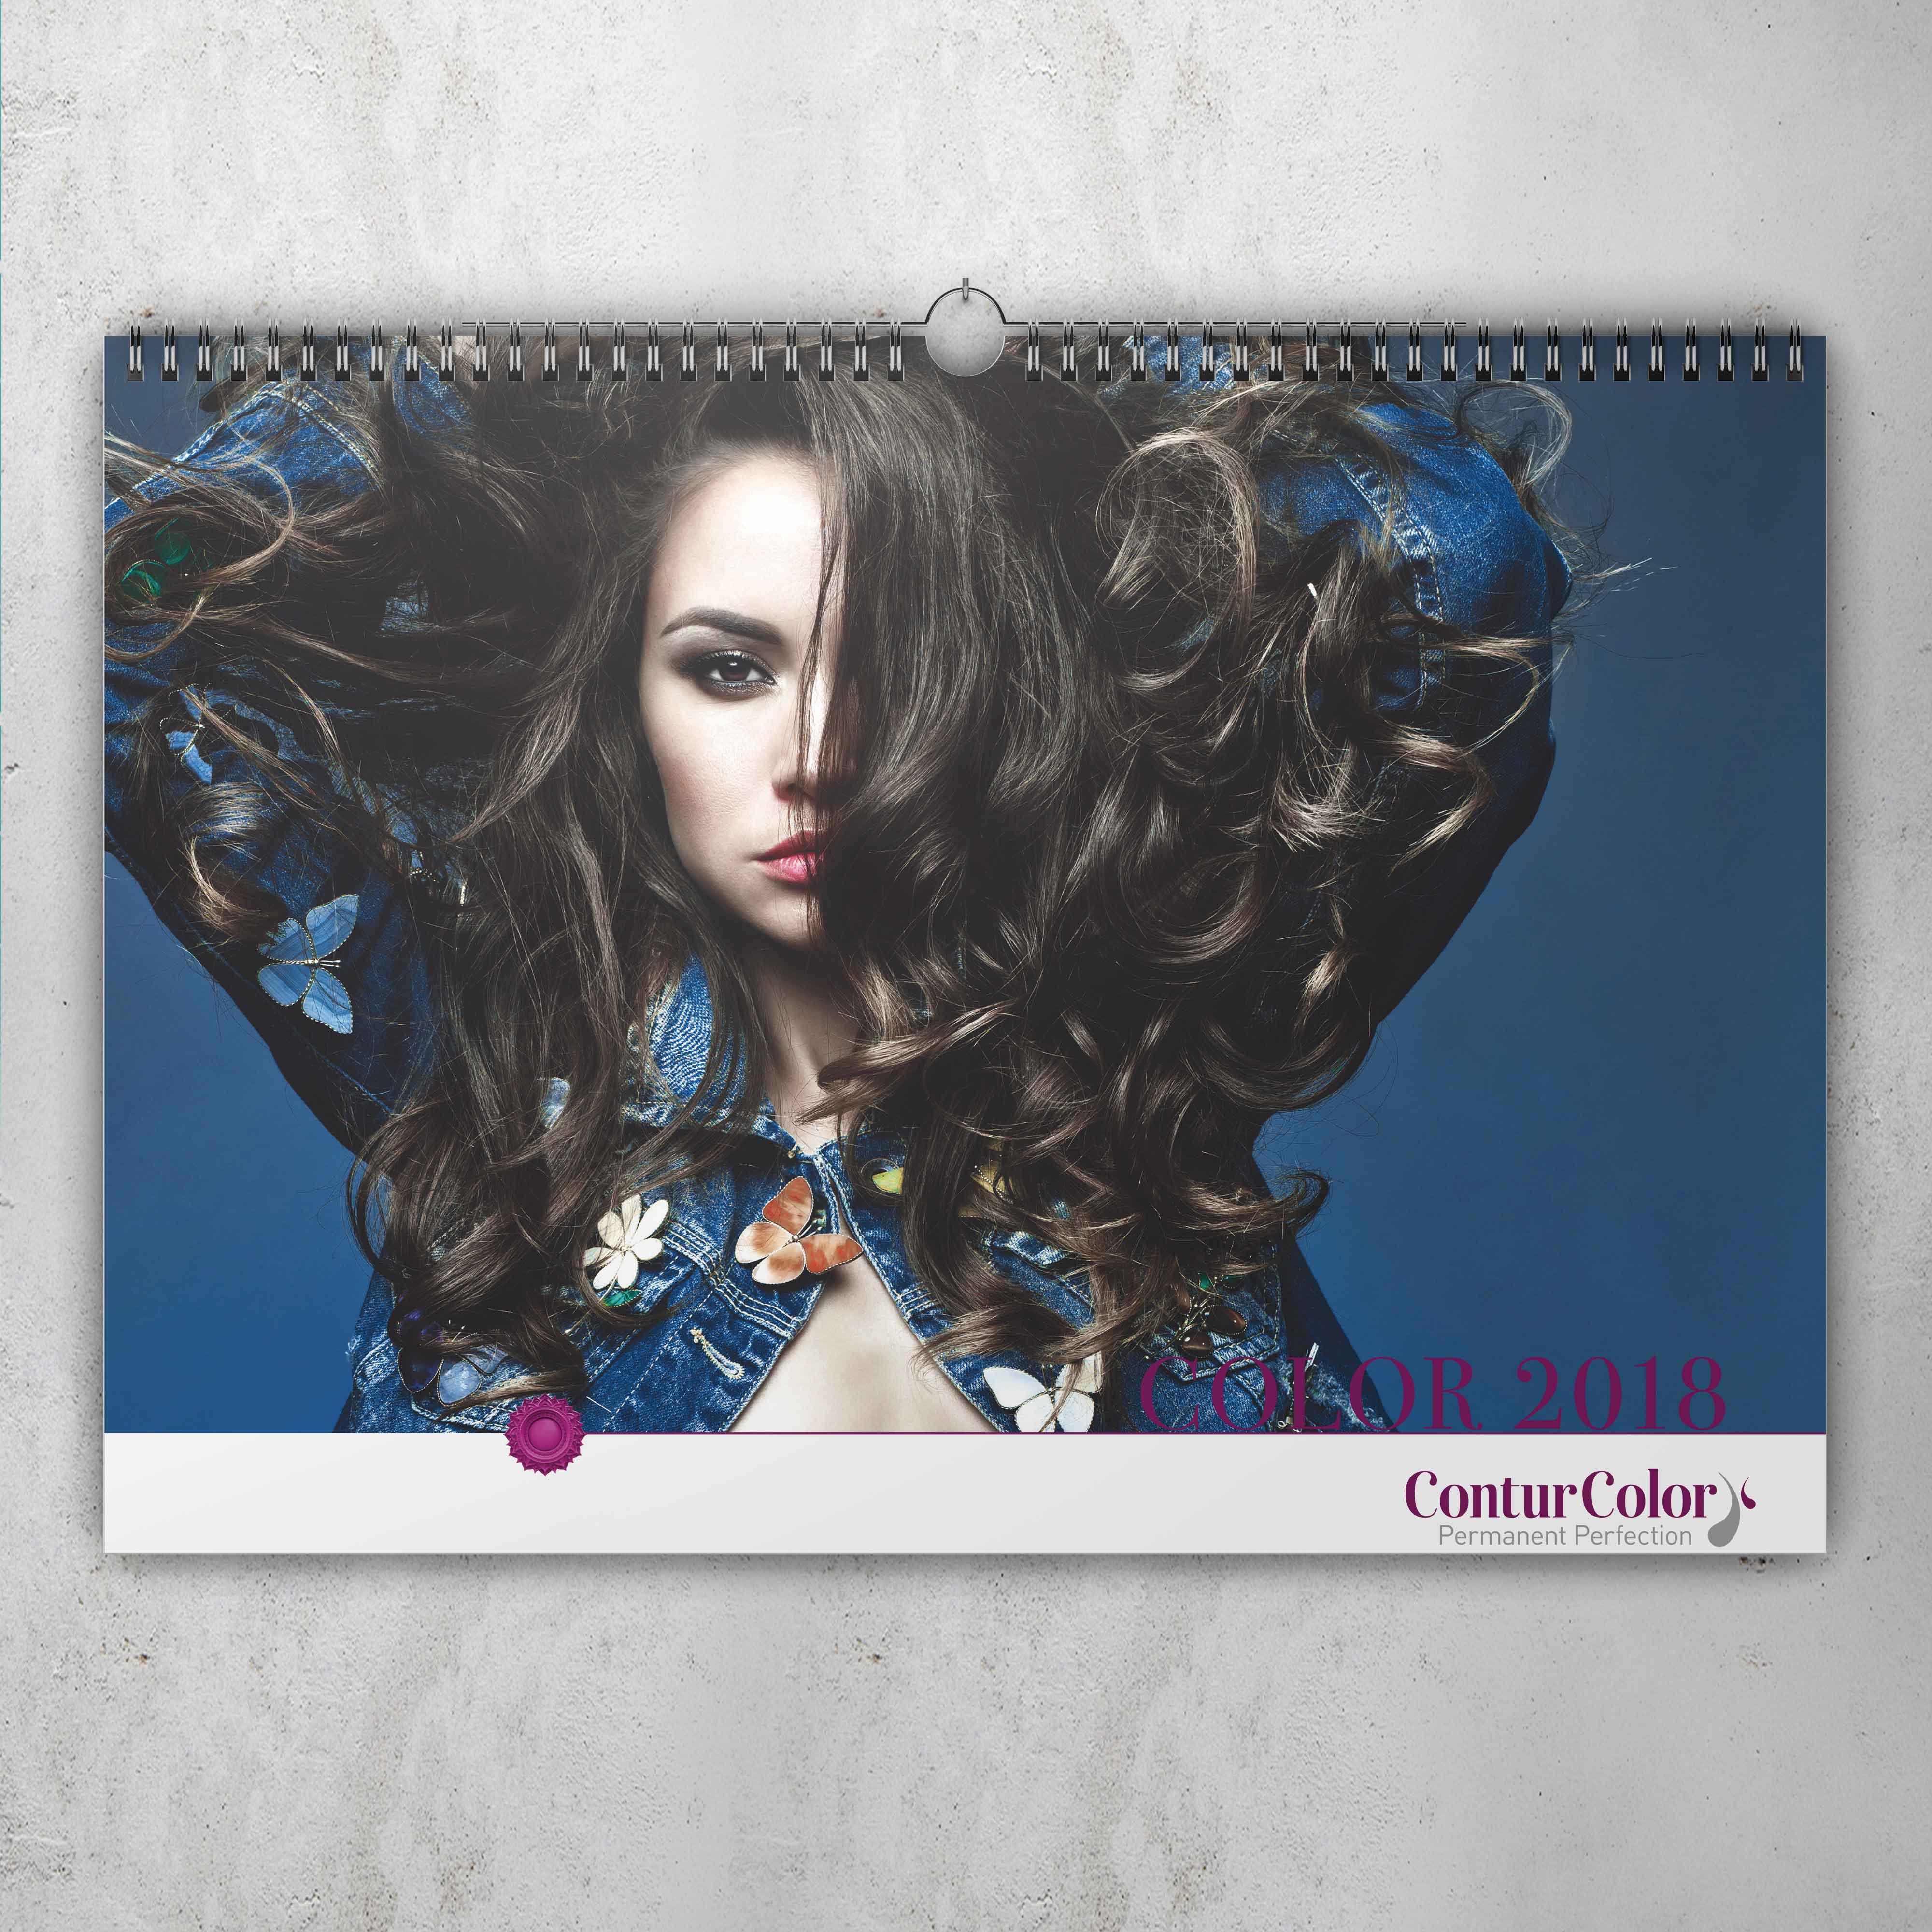 ConturColor-Kalender